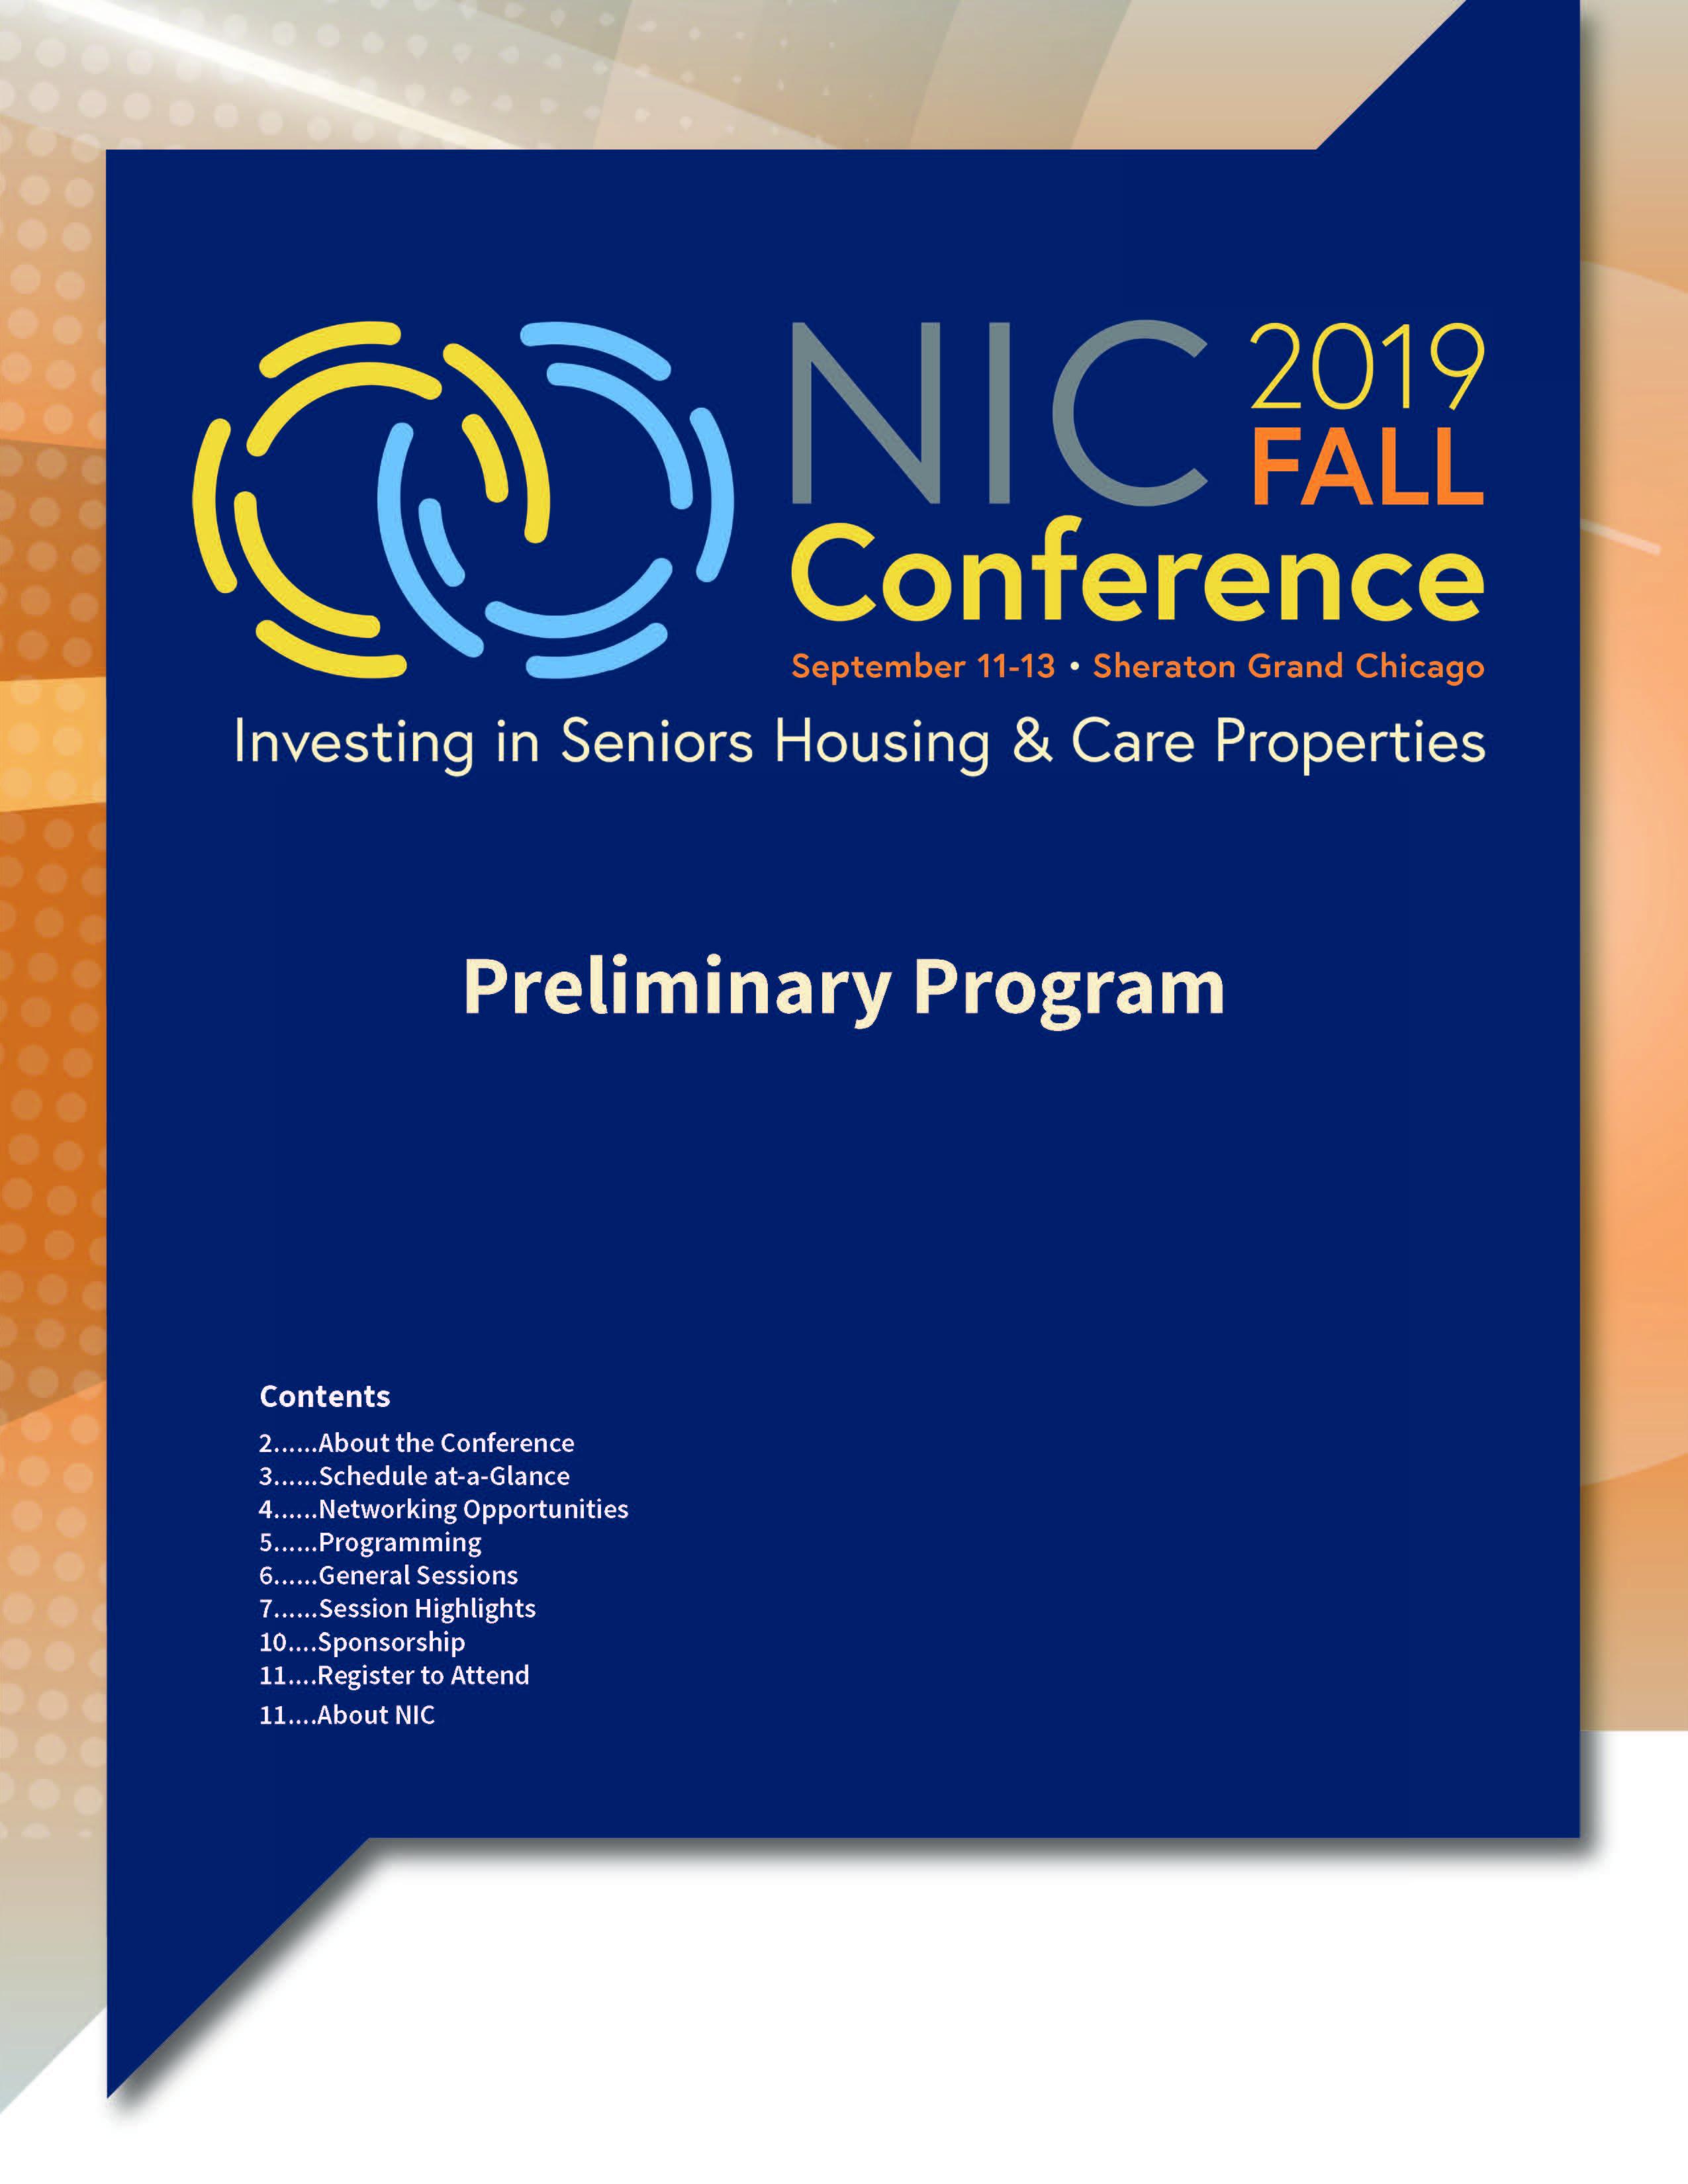 2019 NIC Fall Conference Preliminary Program Cover